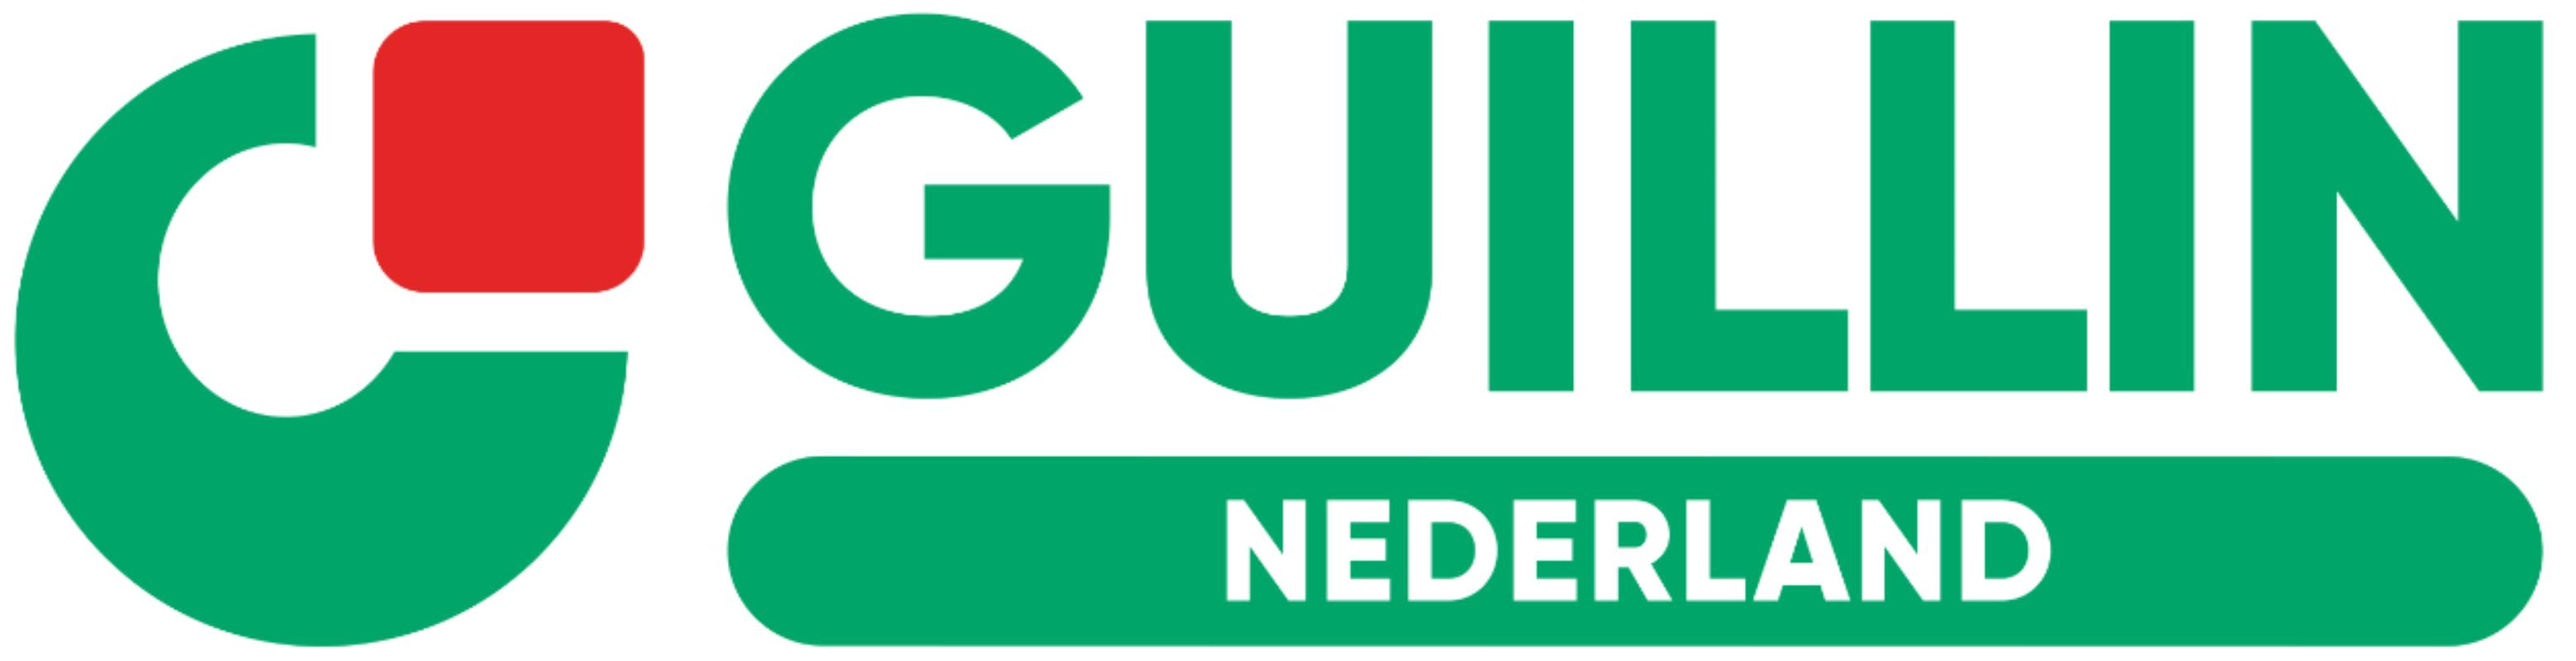 Guillin Nederland logo